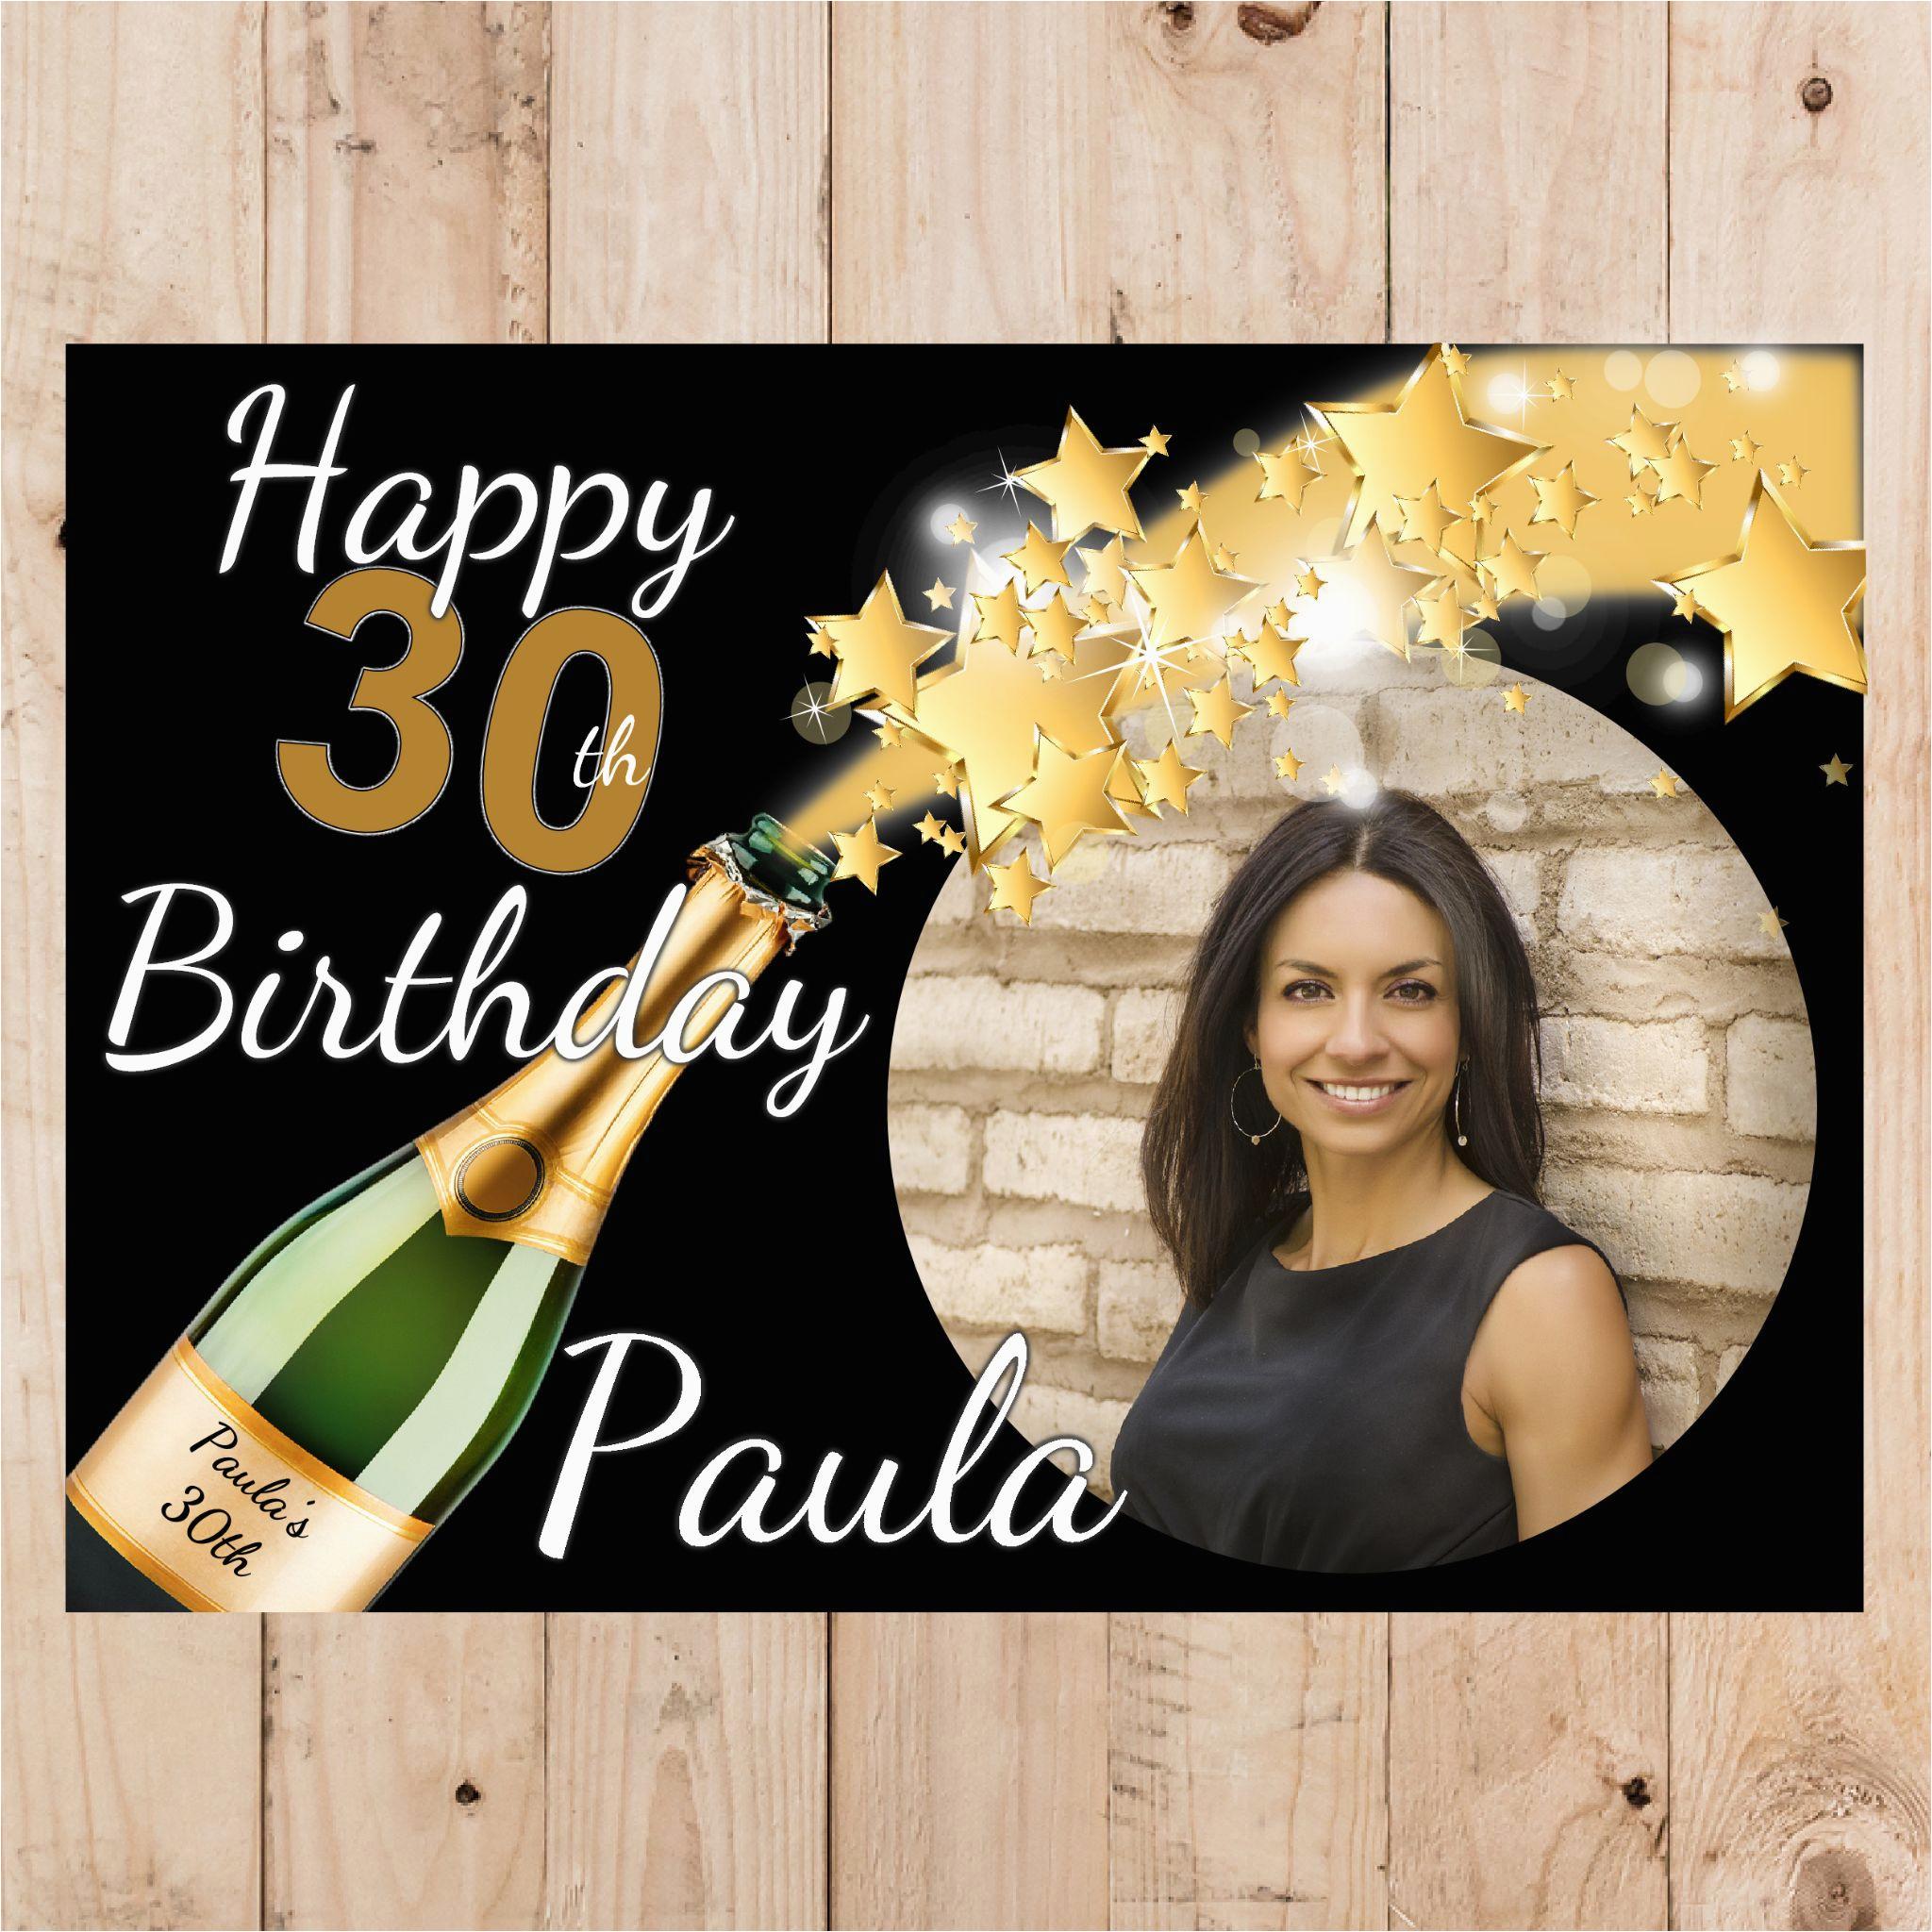 personalised champagne starburst happy birthday photo poster banner n54 14065 p